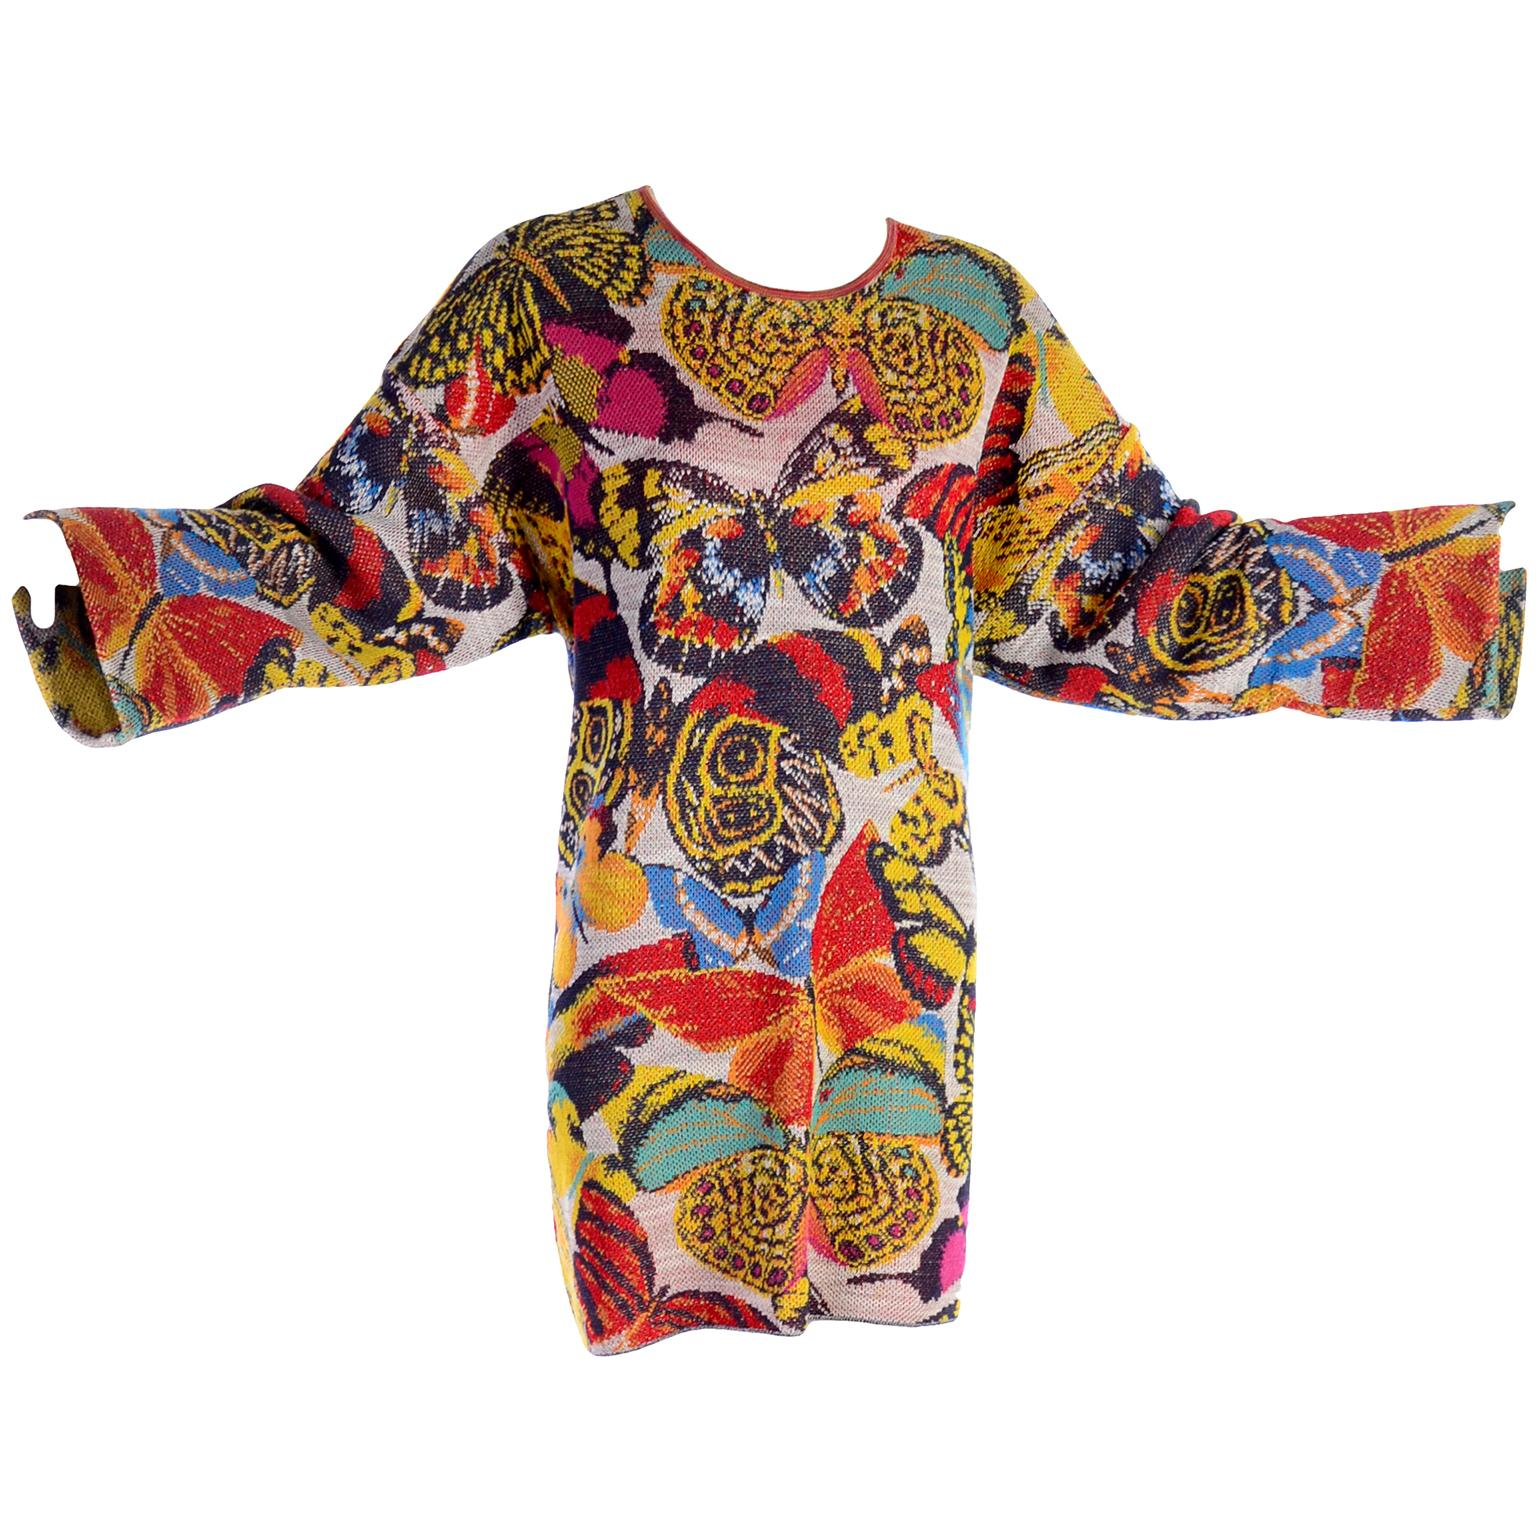 755e344338 Dressing Vintage Sweaters - 1stdibs